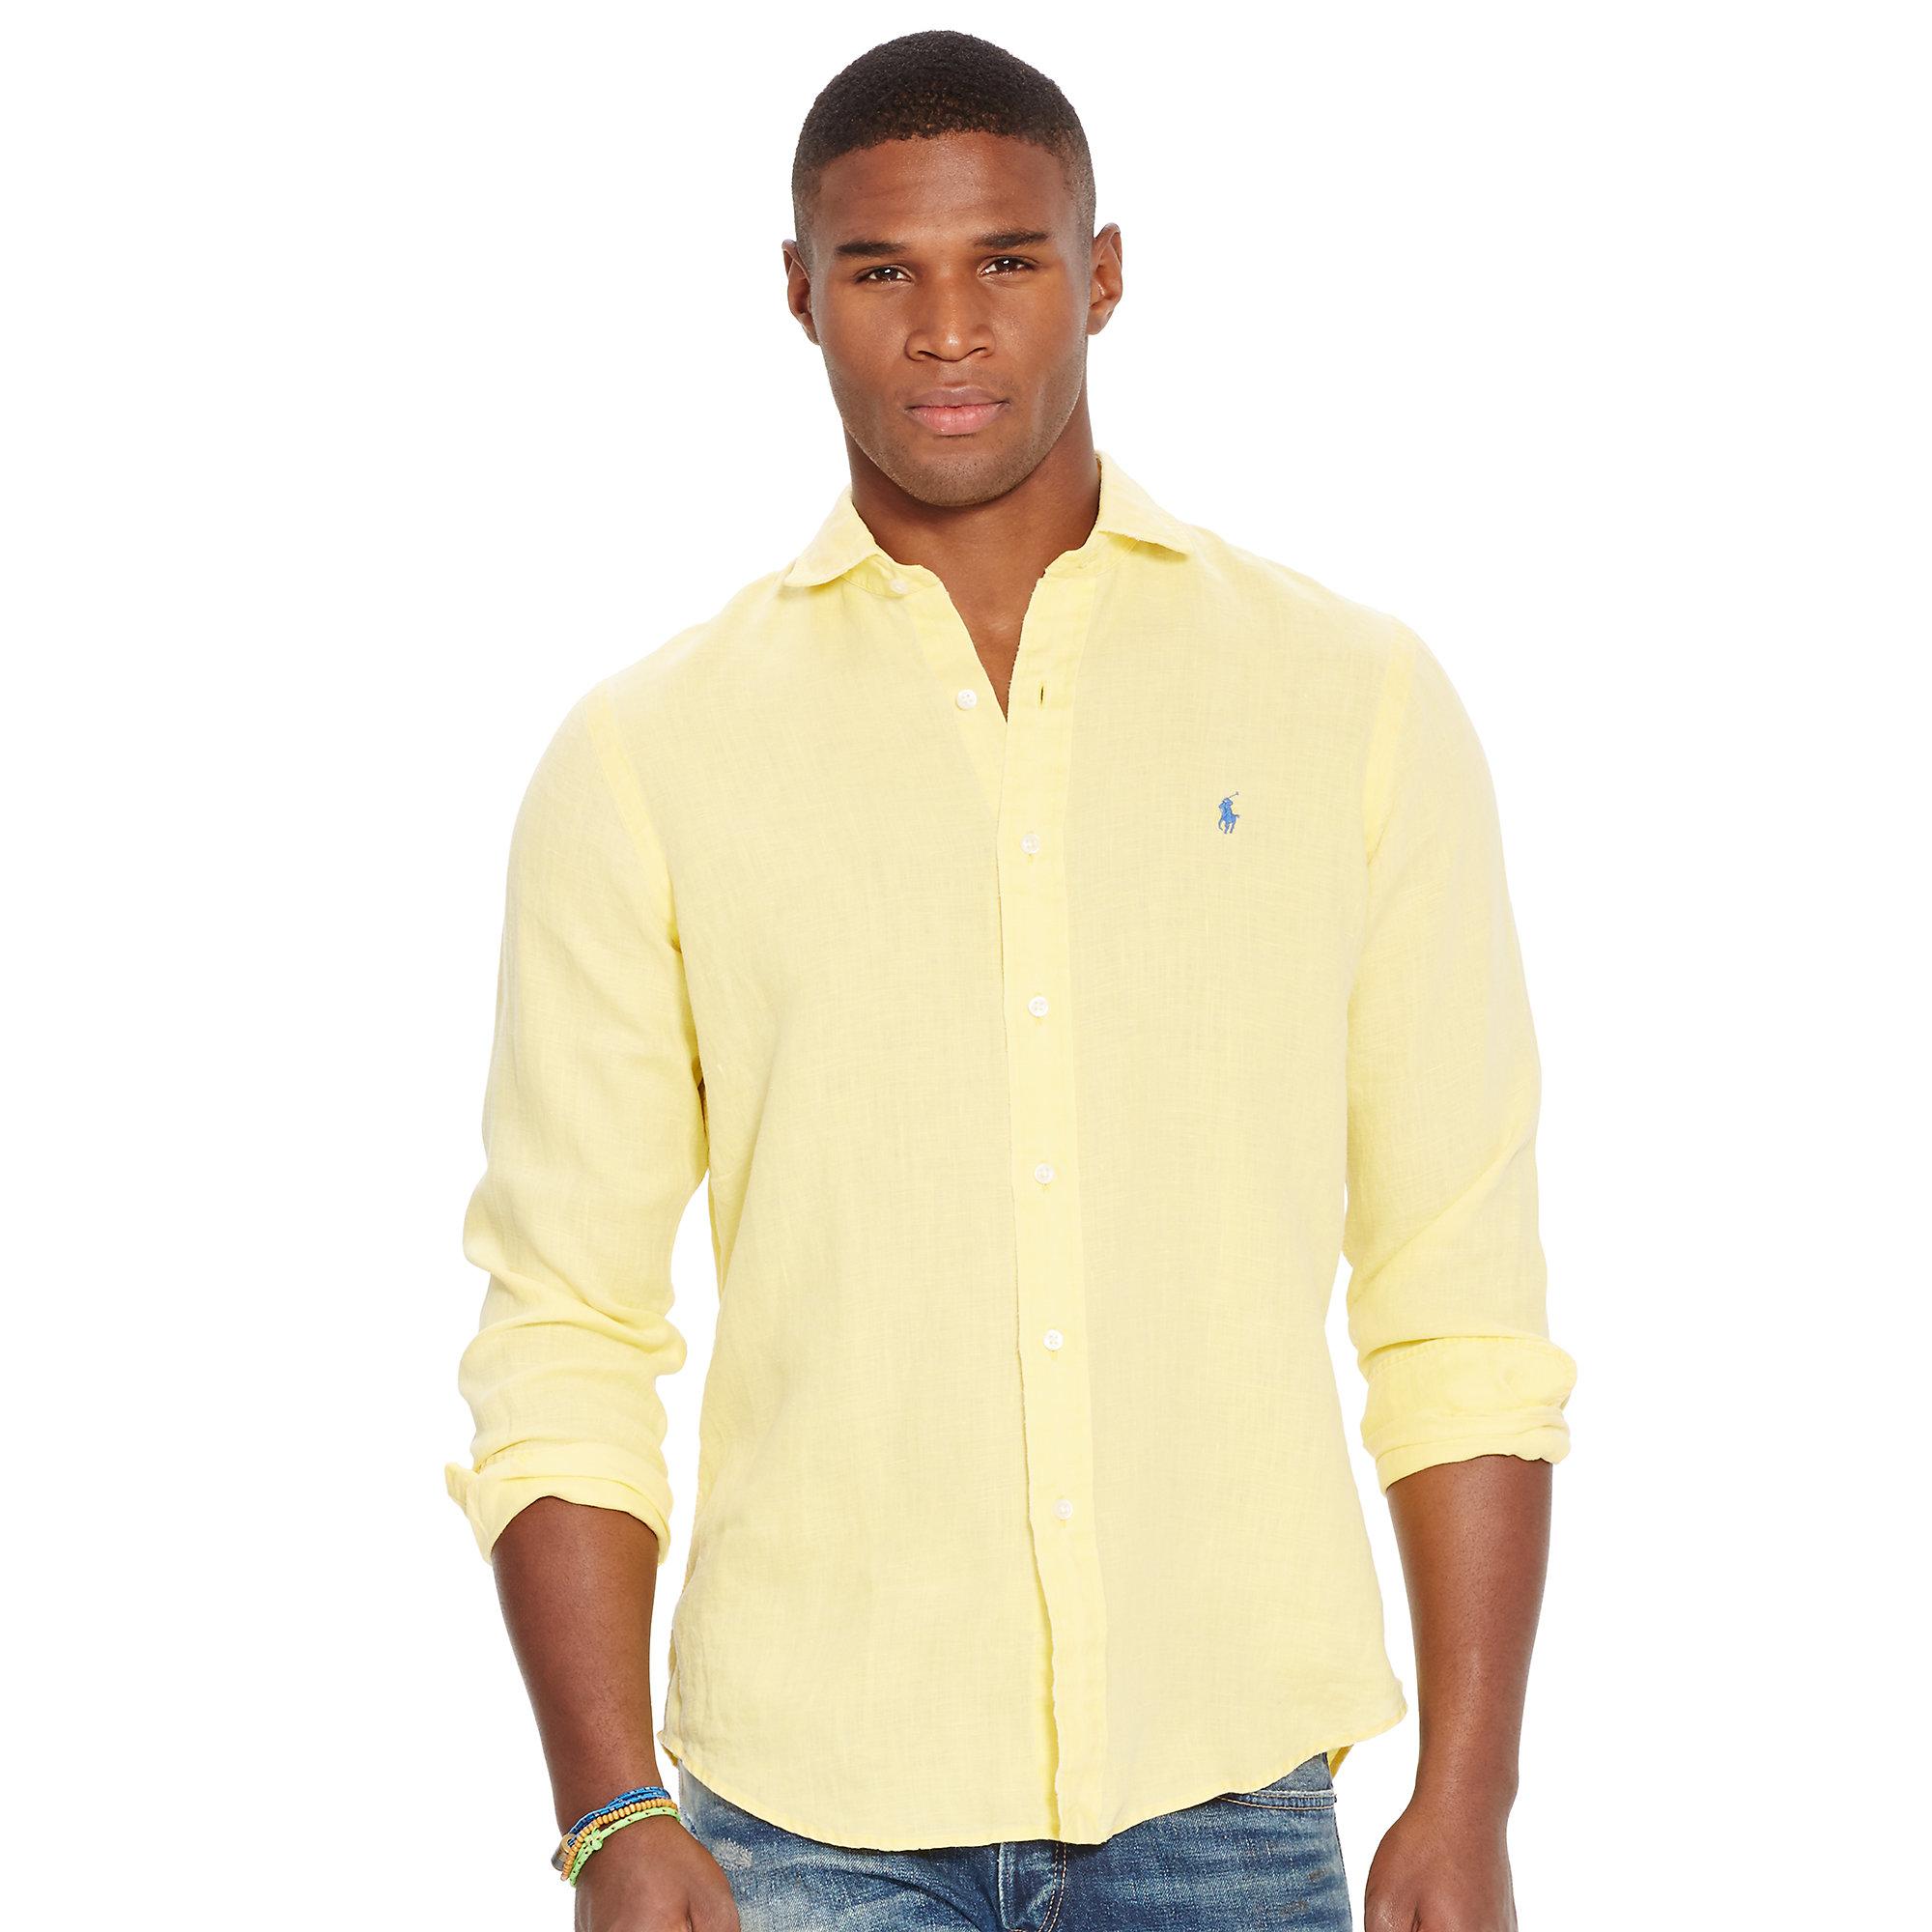 ff584196 Polo Ralph Lauren Slim Fit Shirt in Yellow for Men - Lyst